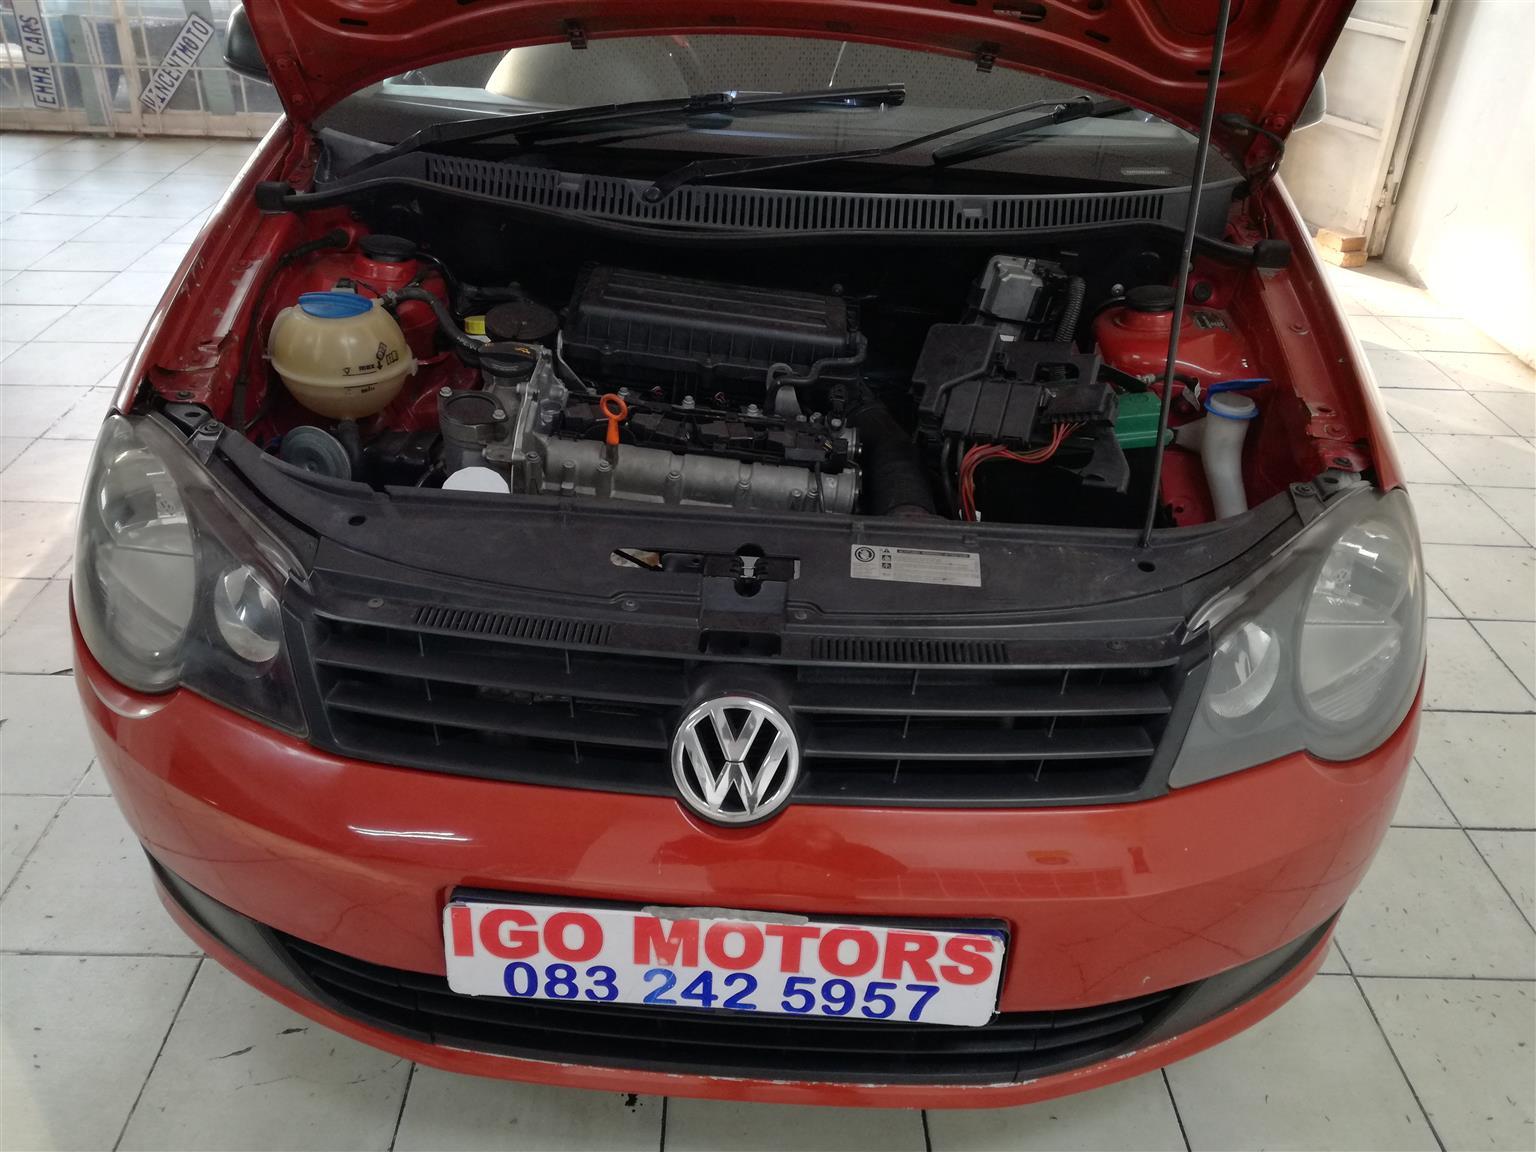 2010 Volkswagen Polo Vivo 1.4Trendline Mechanically perfect